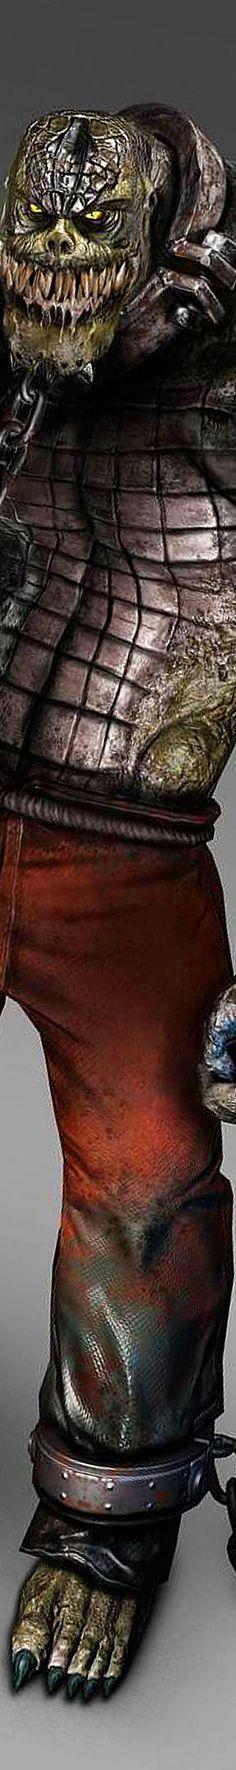 croc # the dark knight wayne city ivy dent face wing beyond comics comics the night so serious Arkham City Riddler, Batman Arkham Games, Batman Games, Batman Arkham Asylum, Im Batman, Batman Robin, Comic Books Art, Comic Art, Killer Croc